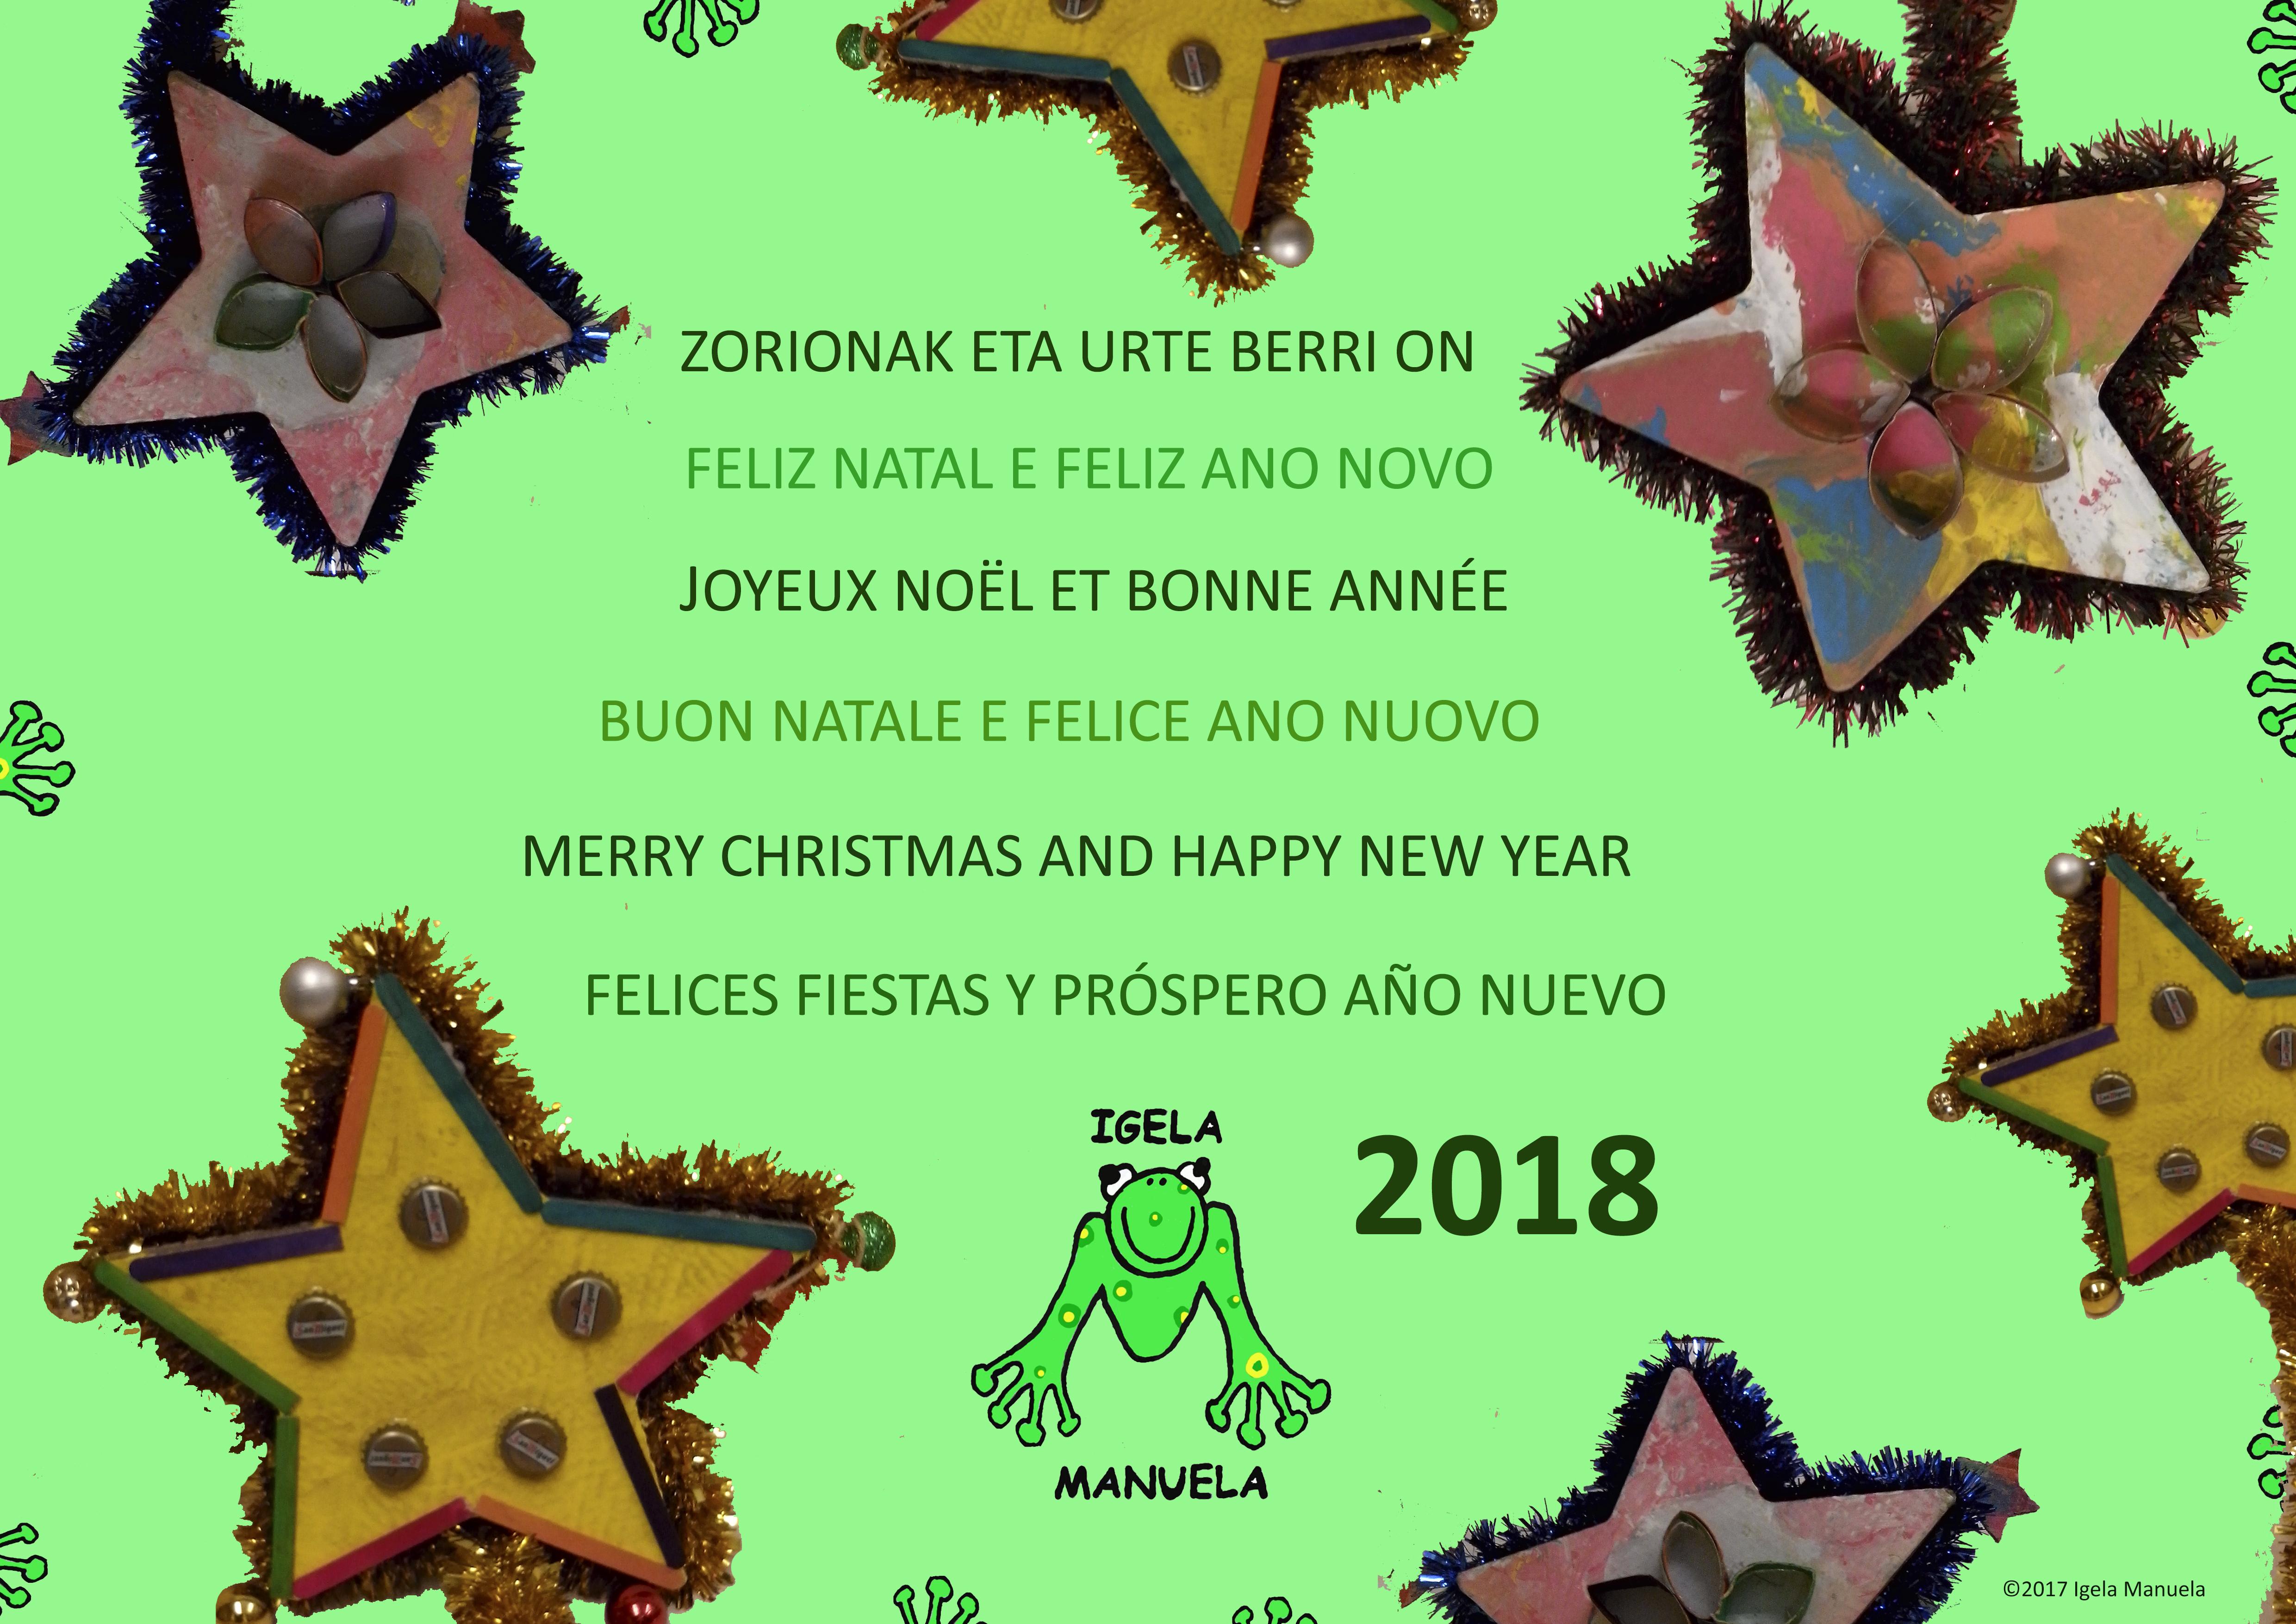 Zorionak 2018-Igela Manuela